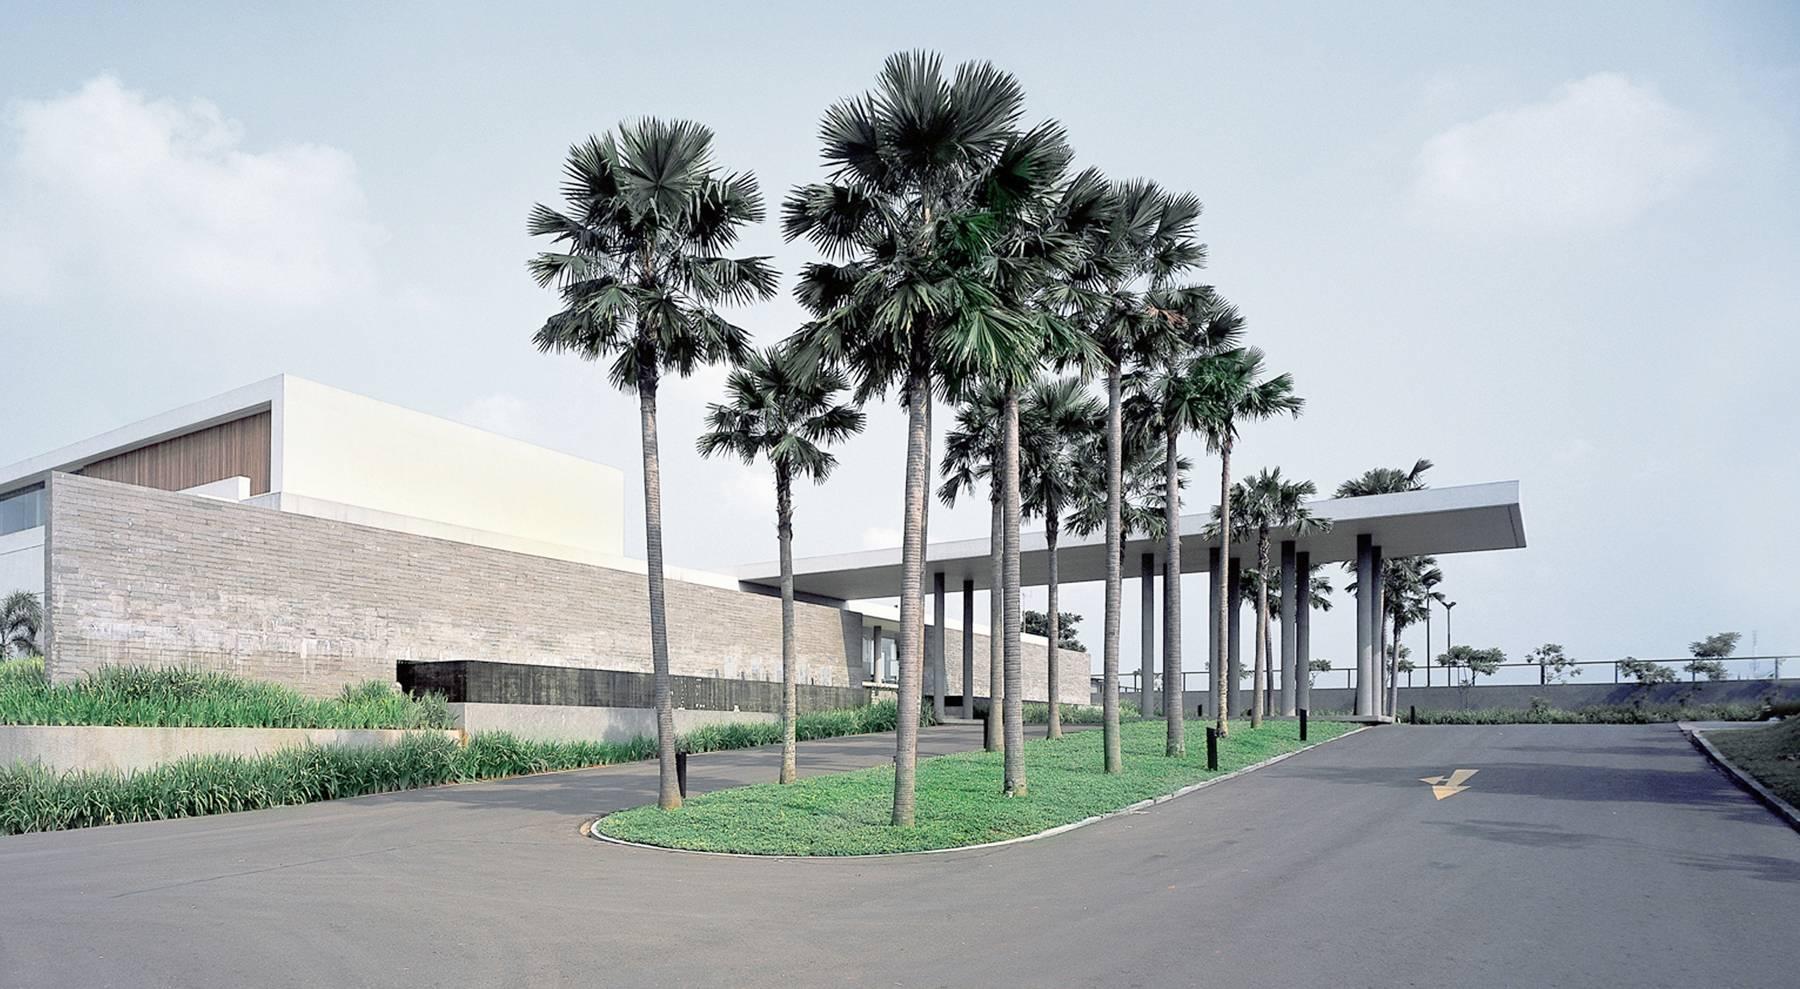 Antony Liu + Ferry Ridwan / Studio Tonton Bukit Golf Club House Cimanggis Cimanggis Exterior View Modern  8011